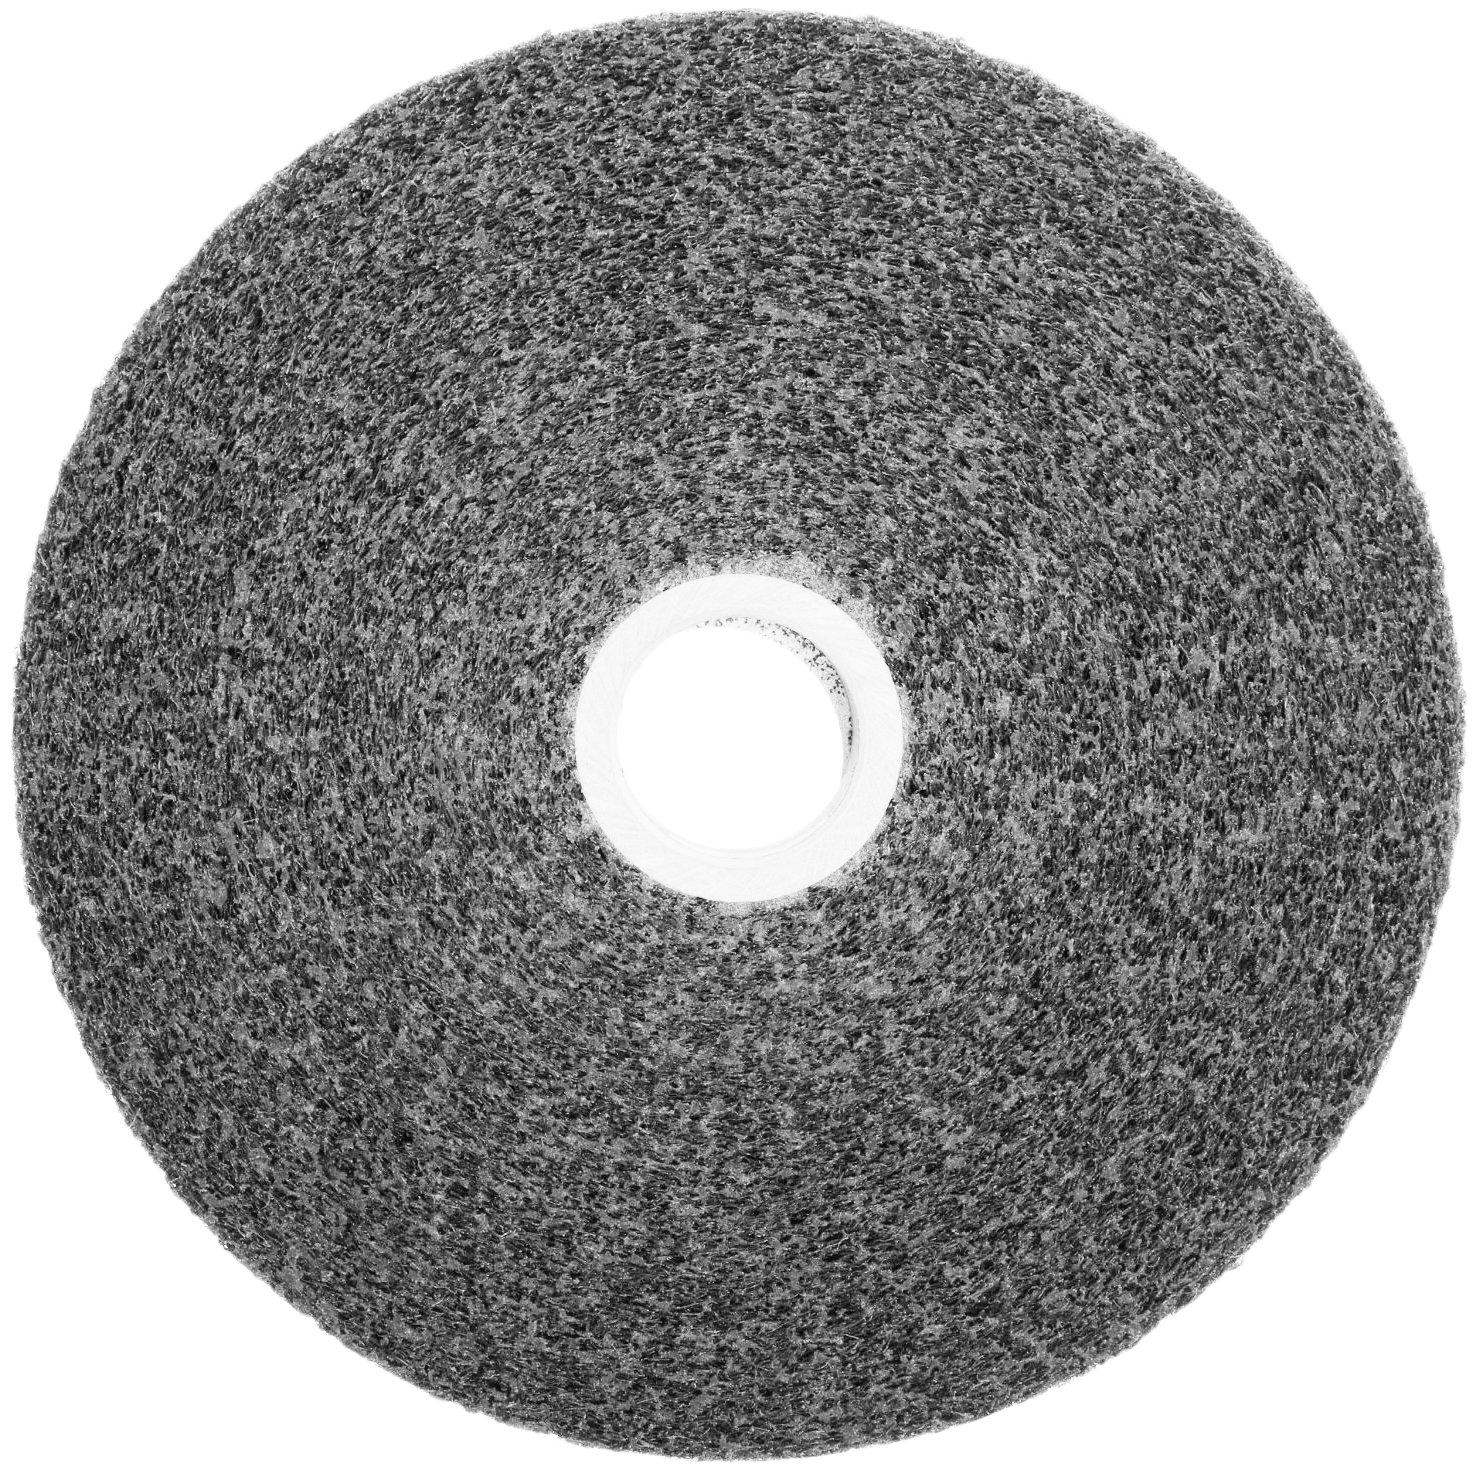 Scotch-Brite(TM) Multi-Finishing Wheel, Silicon Carbide, 6000 rpm, 6 Diameter x 1 Width, 1 Arbor, 2S Fine Grit  (Pack of 3) by Scotch-Brite